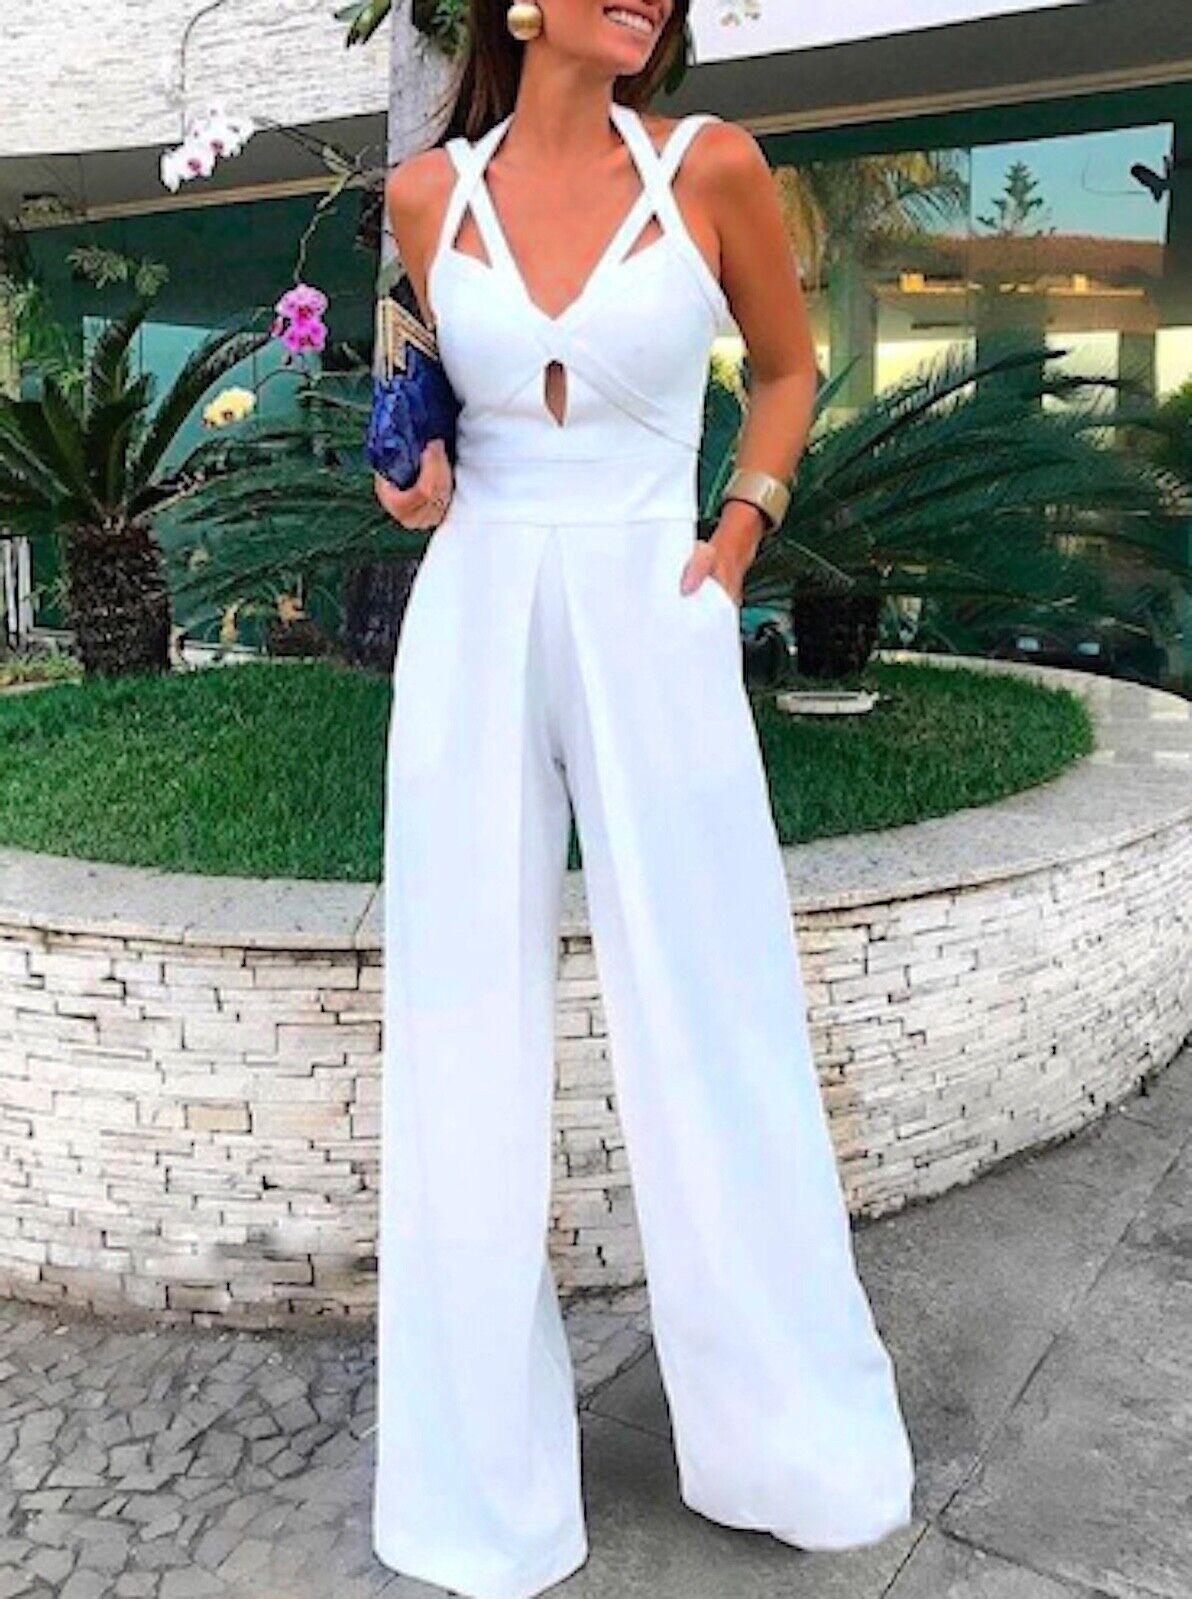 Tuta Pantaloni Casual Cerimonia Donna 11 Colori Woman Jampsuit Romper 660015 P